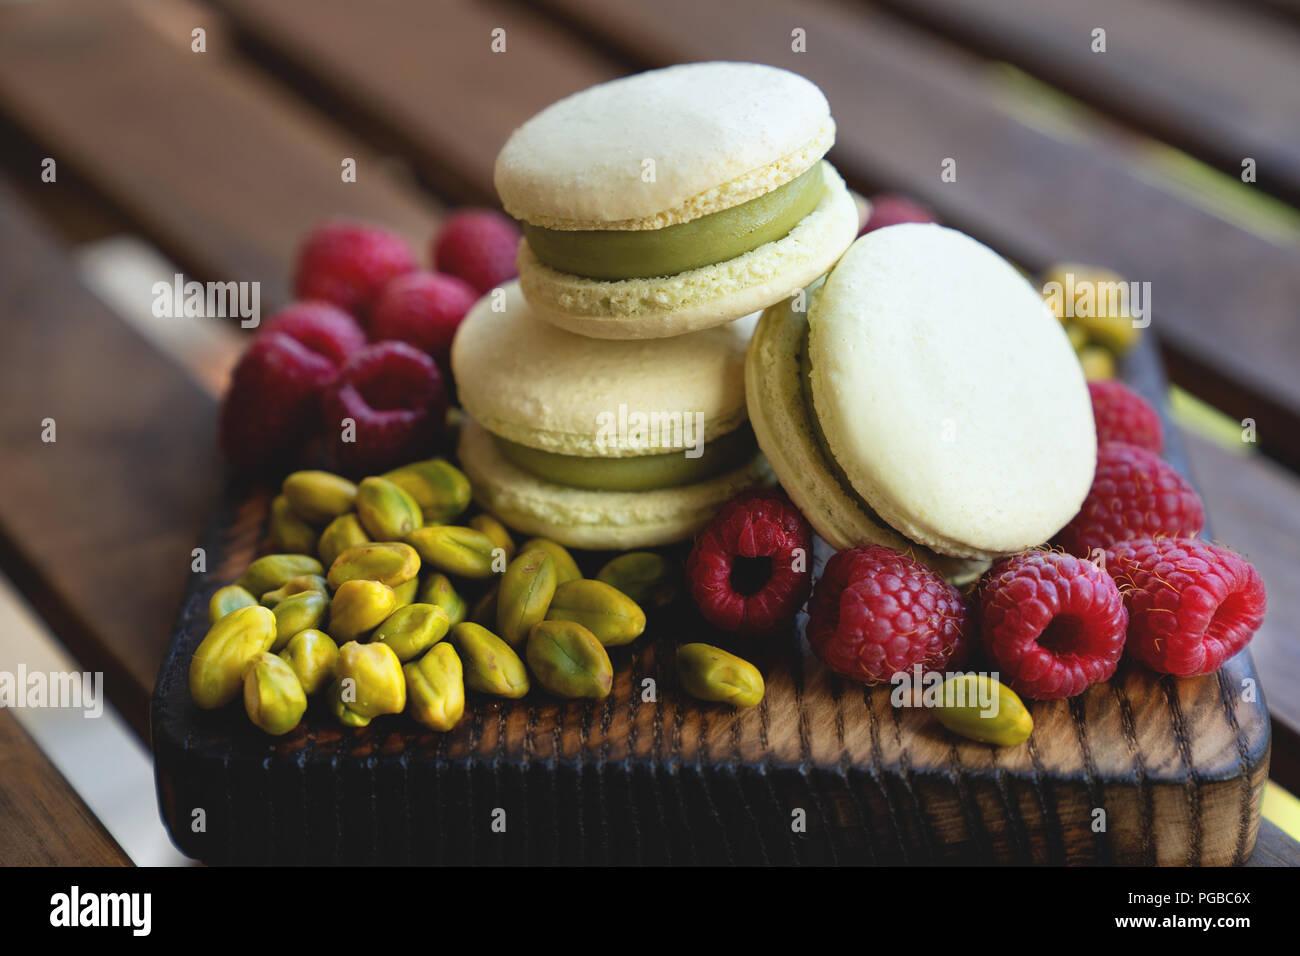 french macaron and pistachio on white background - Stock Image